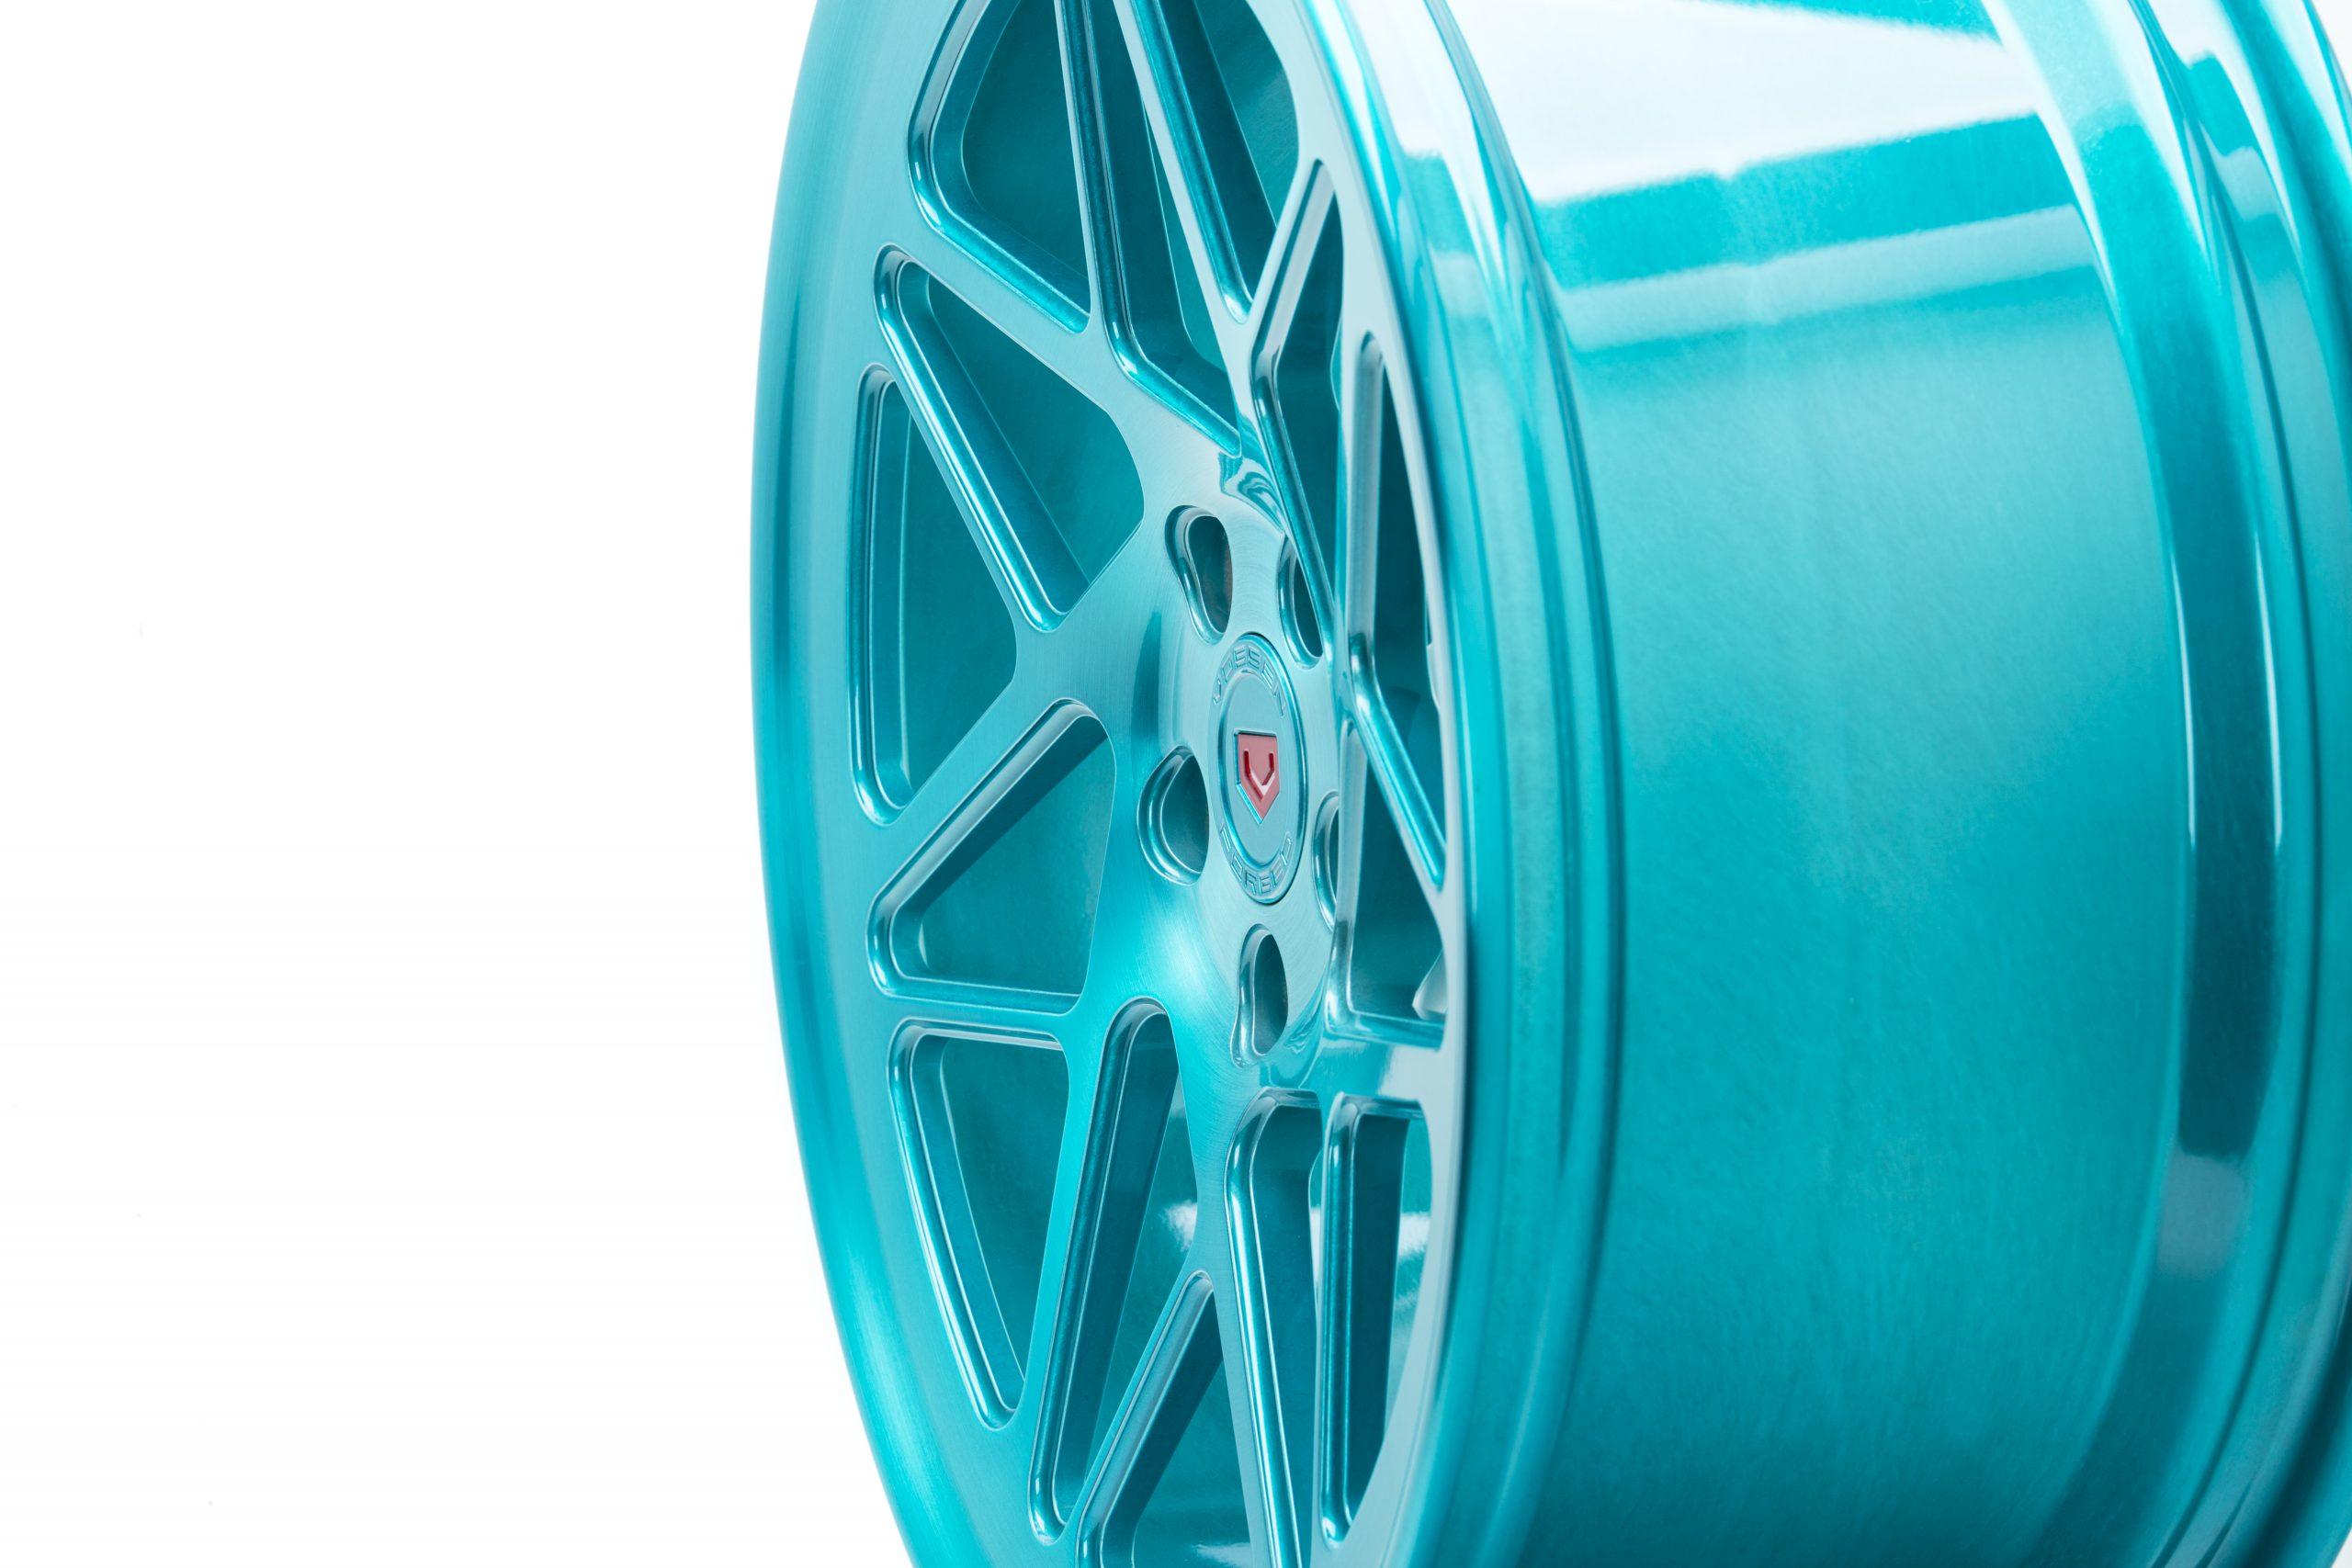 vossen-forged-lc-109t-wheel---c21-deco-teal---lc-series----vossen-wheels-2018--1010_27475973407_o